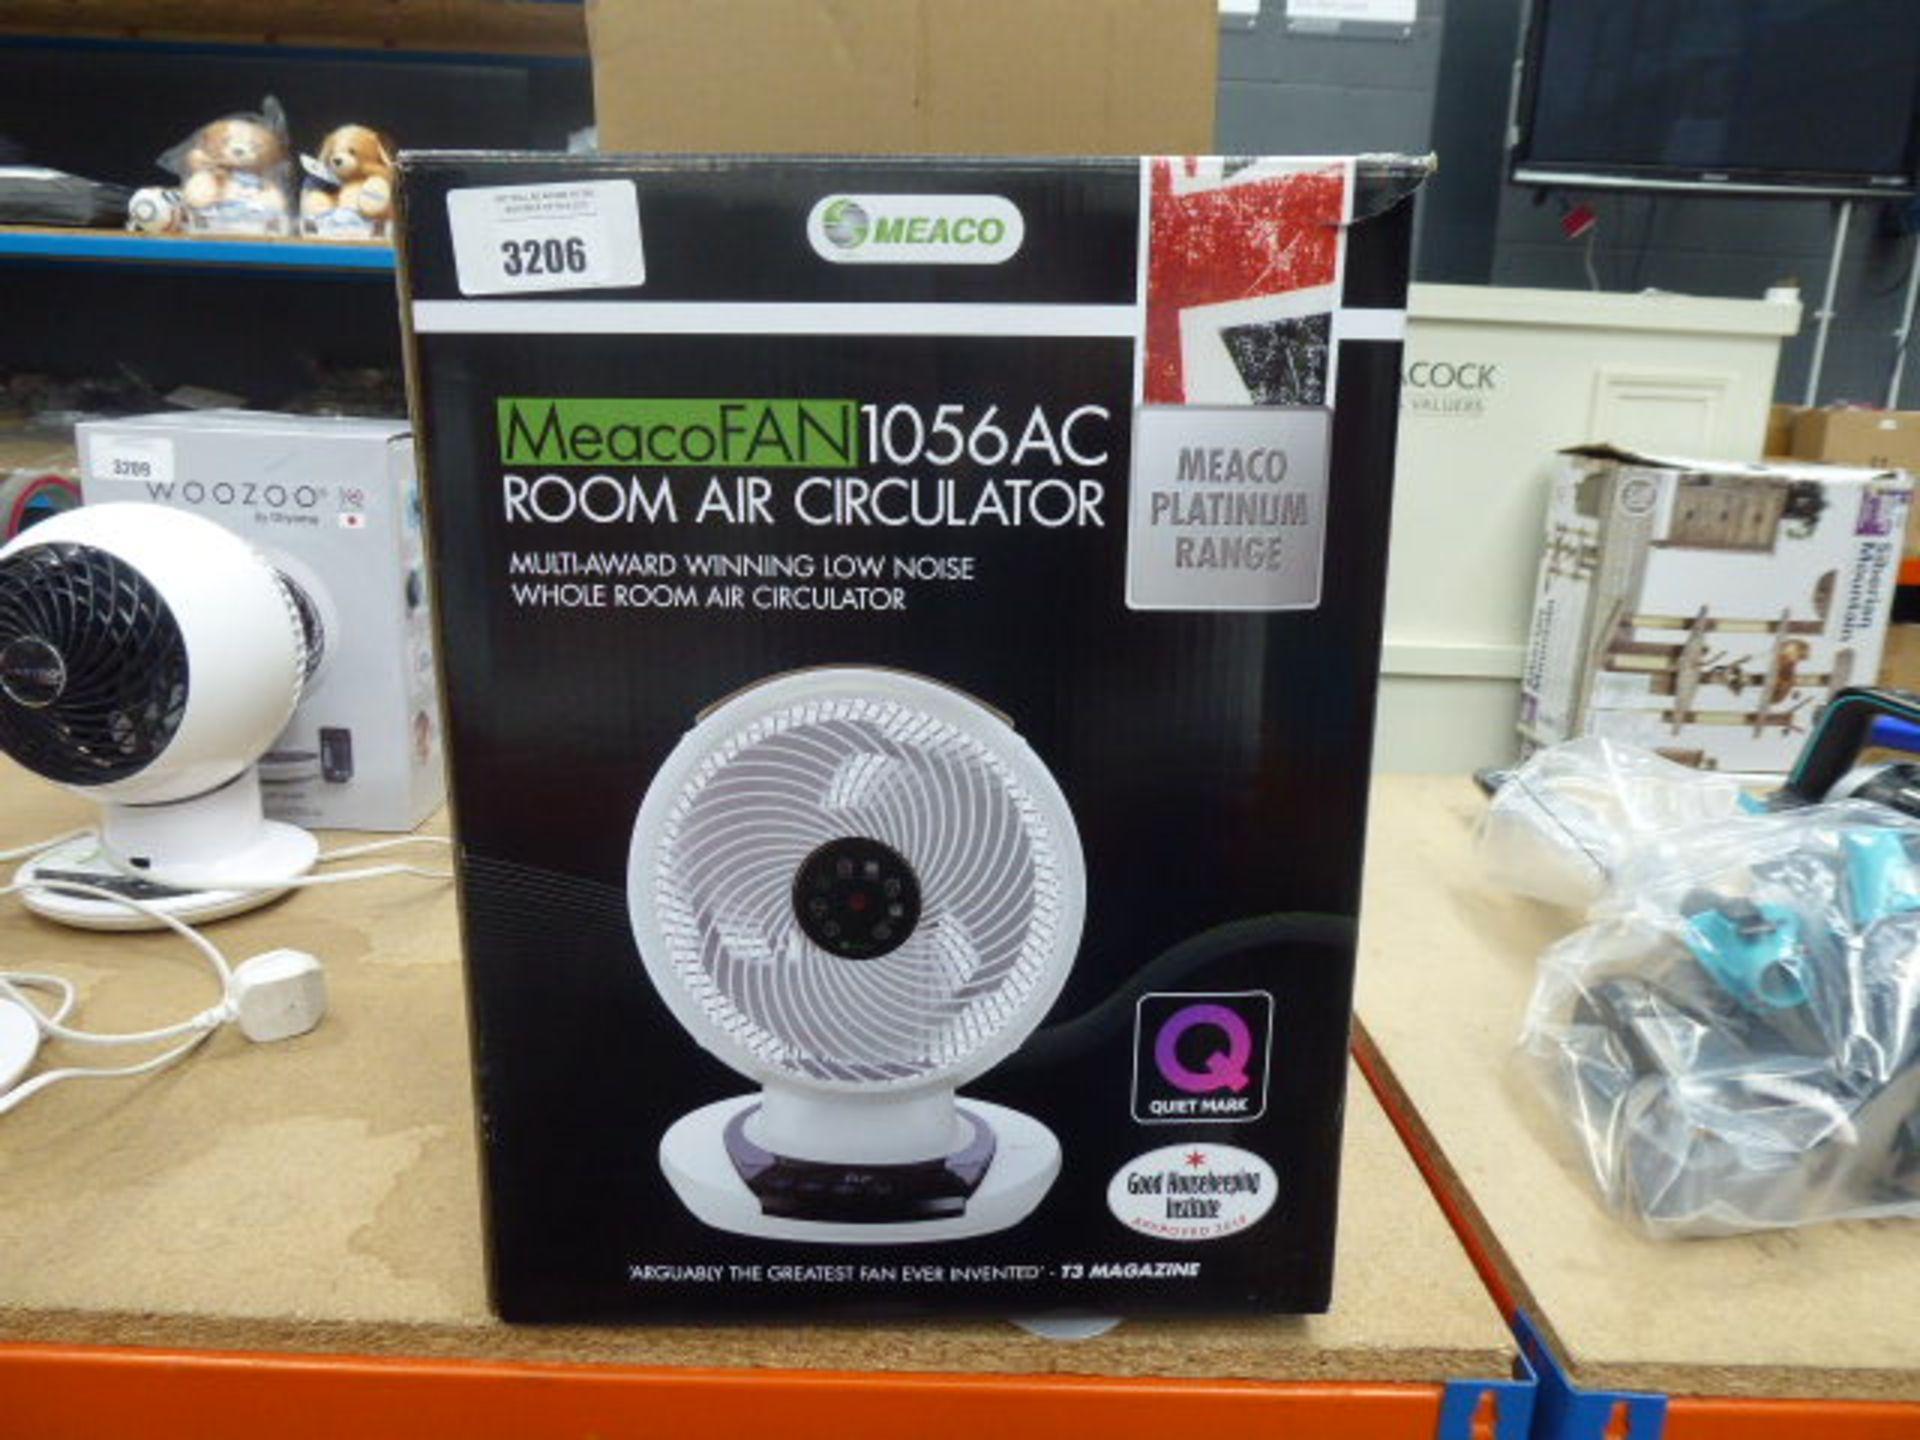 Lot 3206 - Room air circulator fan